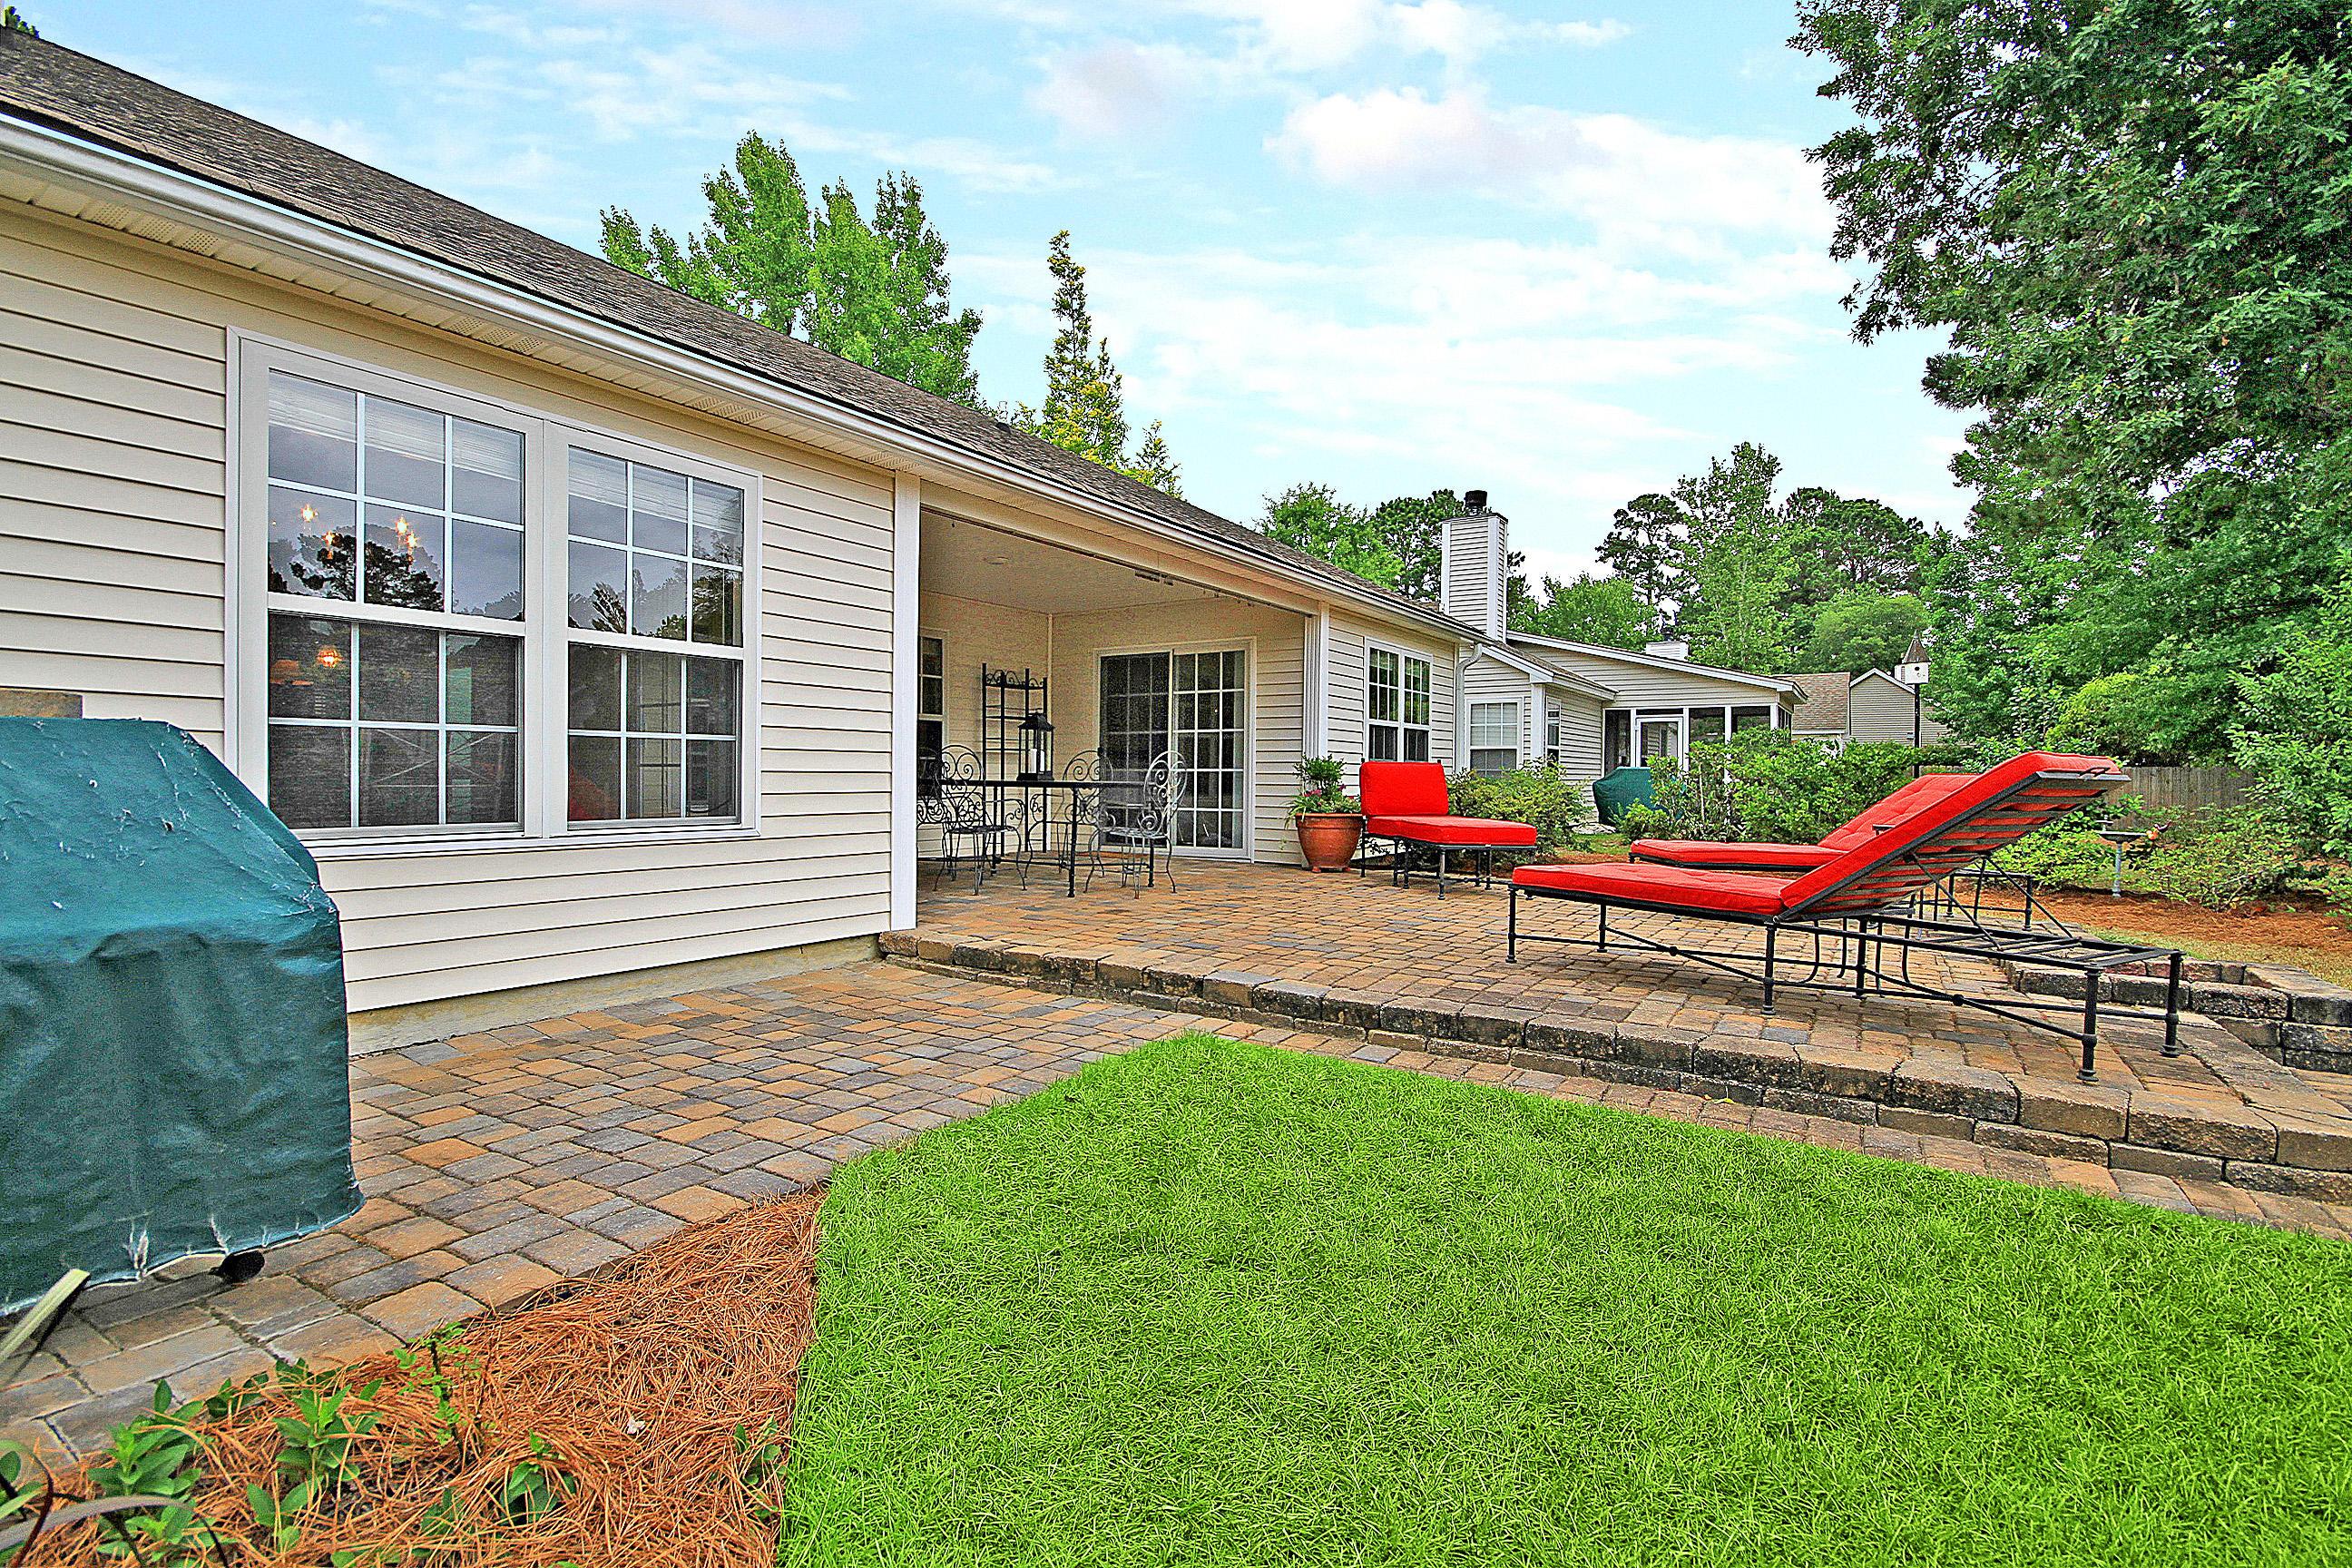 Planters Pointe Homes For Sale - 2863 Curran, Mount Pleasant, SC - 14